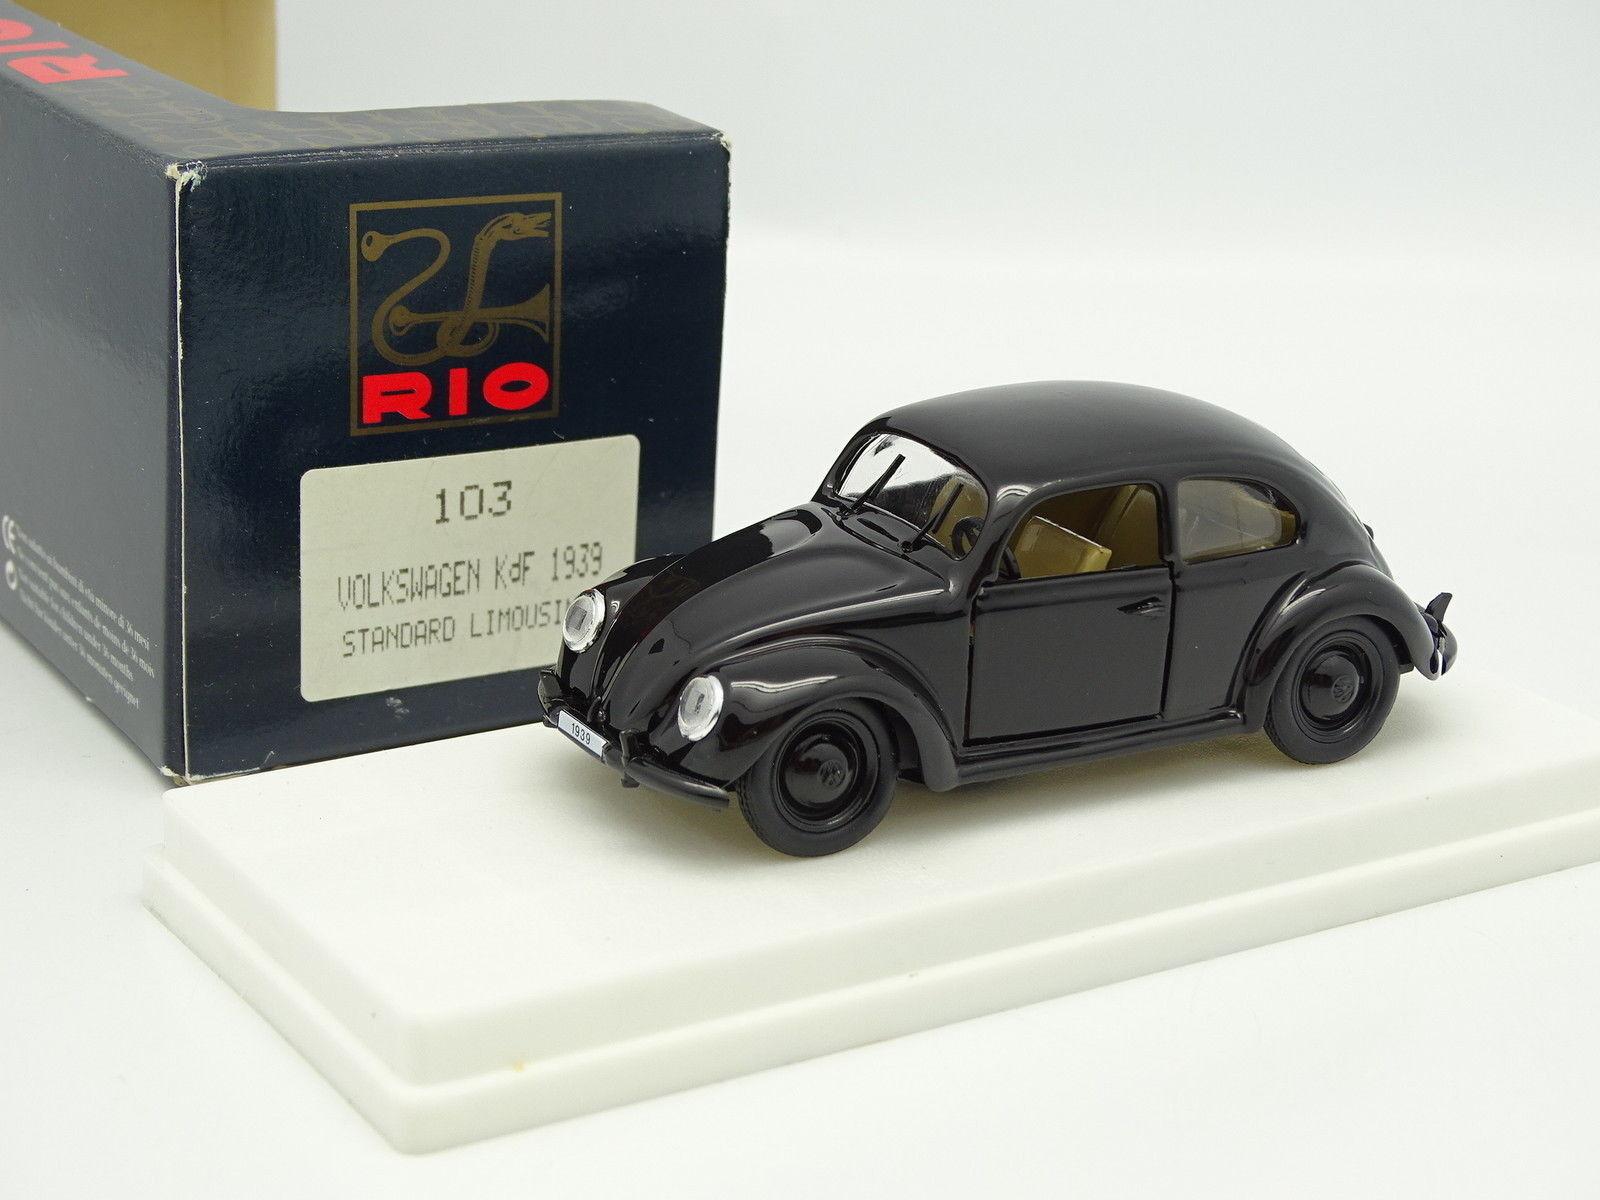 RIO 1 1 1 43 - VW Coccinelle KDF 1939 blacke 12b231